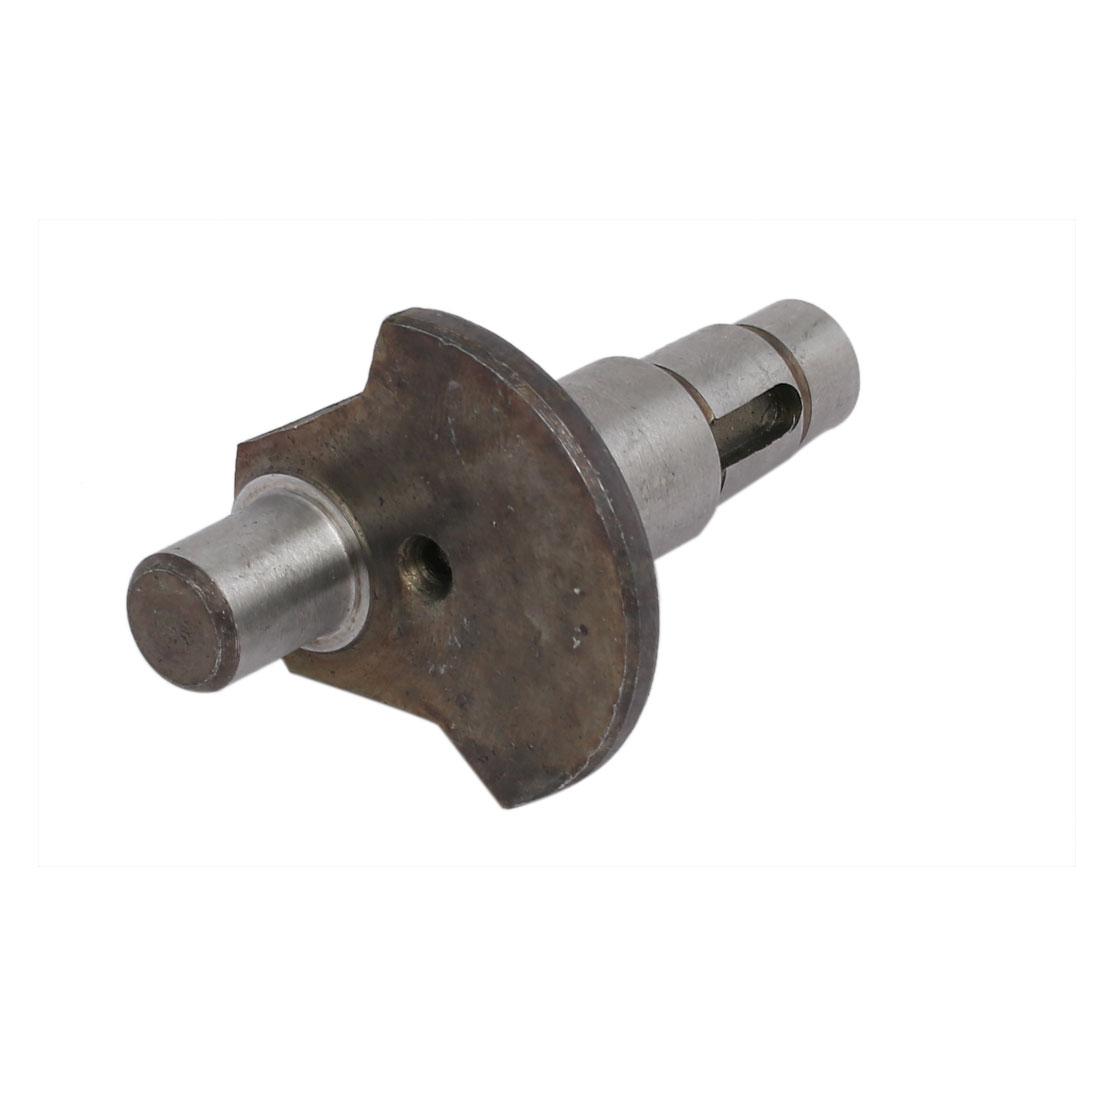 Power Tool Fittings Crankshaft Silver Tone for  0810 Electric Pick - image 2 de 3